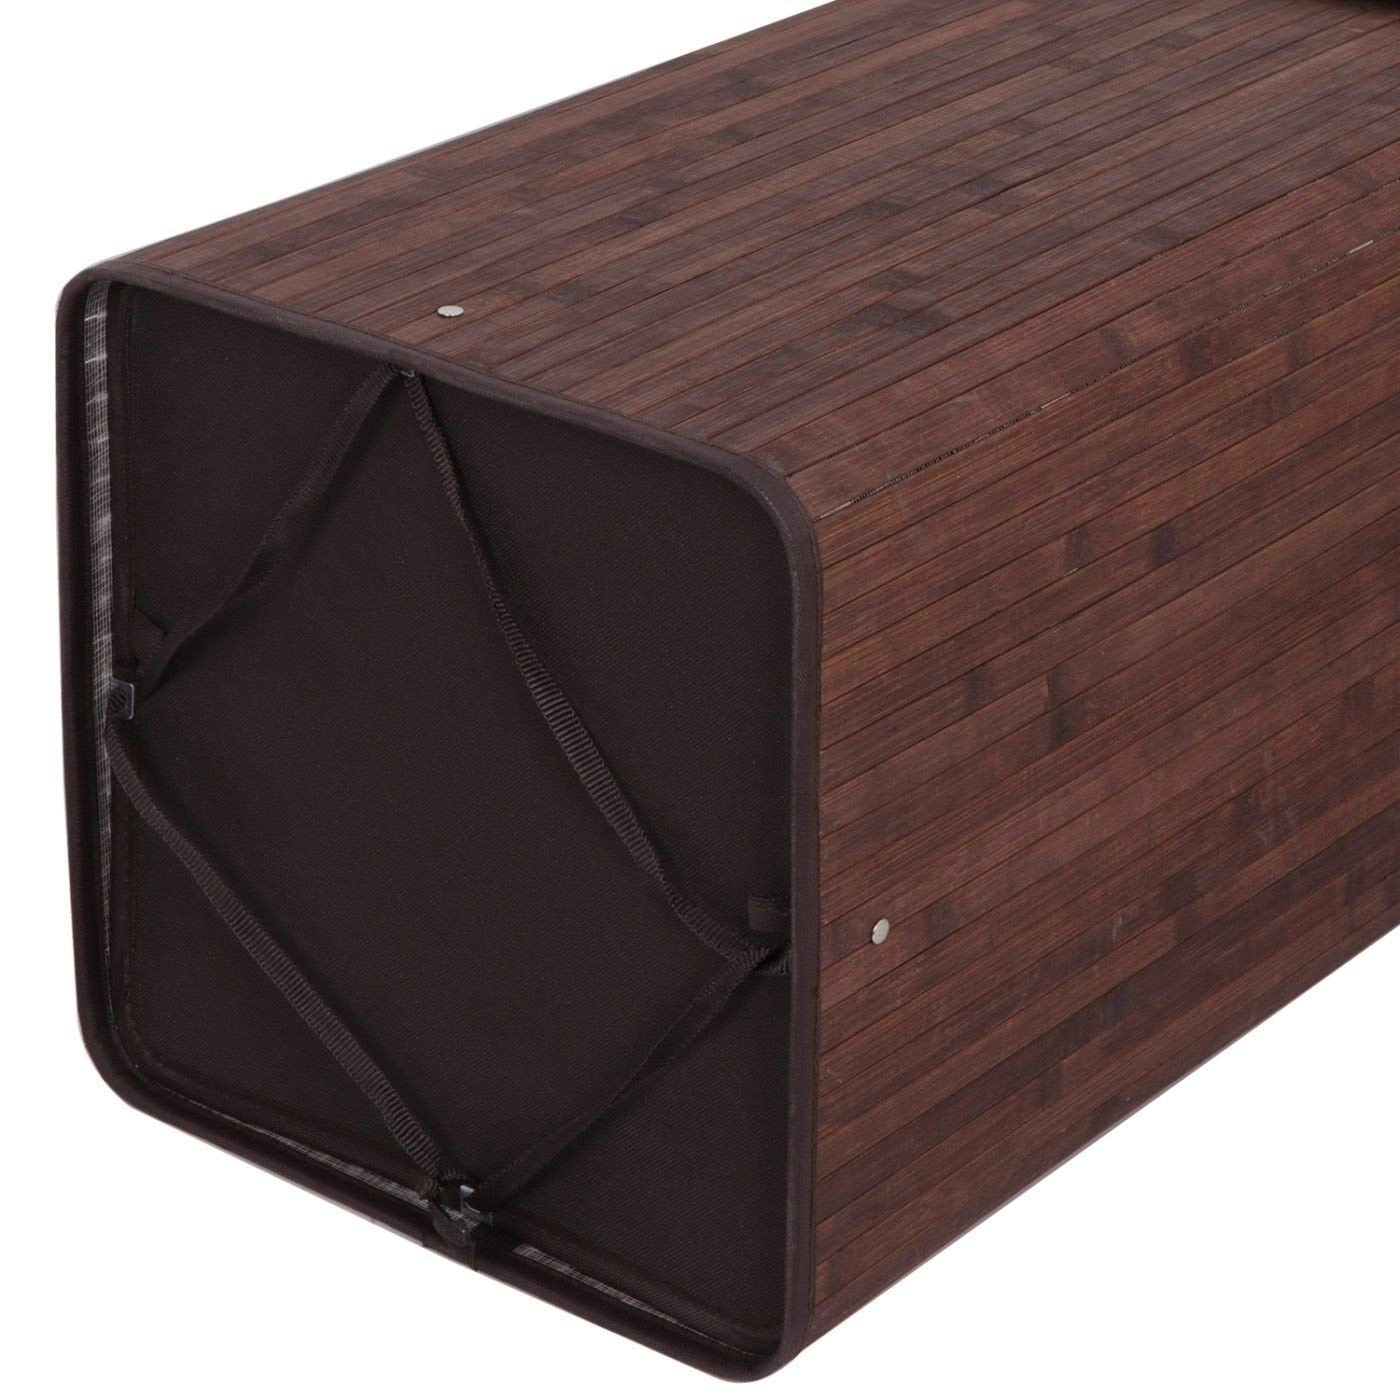 Hamper Laundry Basket Washing Cloth Storage Bin with Folding Lid Dark Brown Eco-Friendly Bamboo